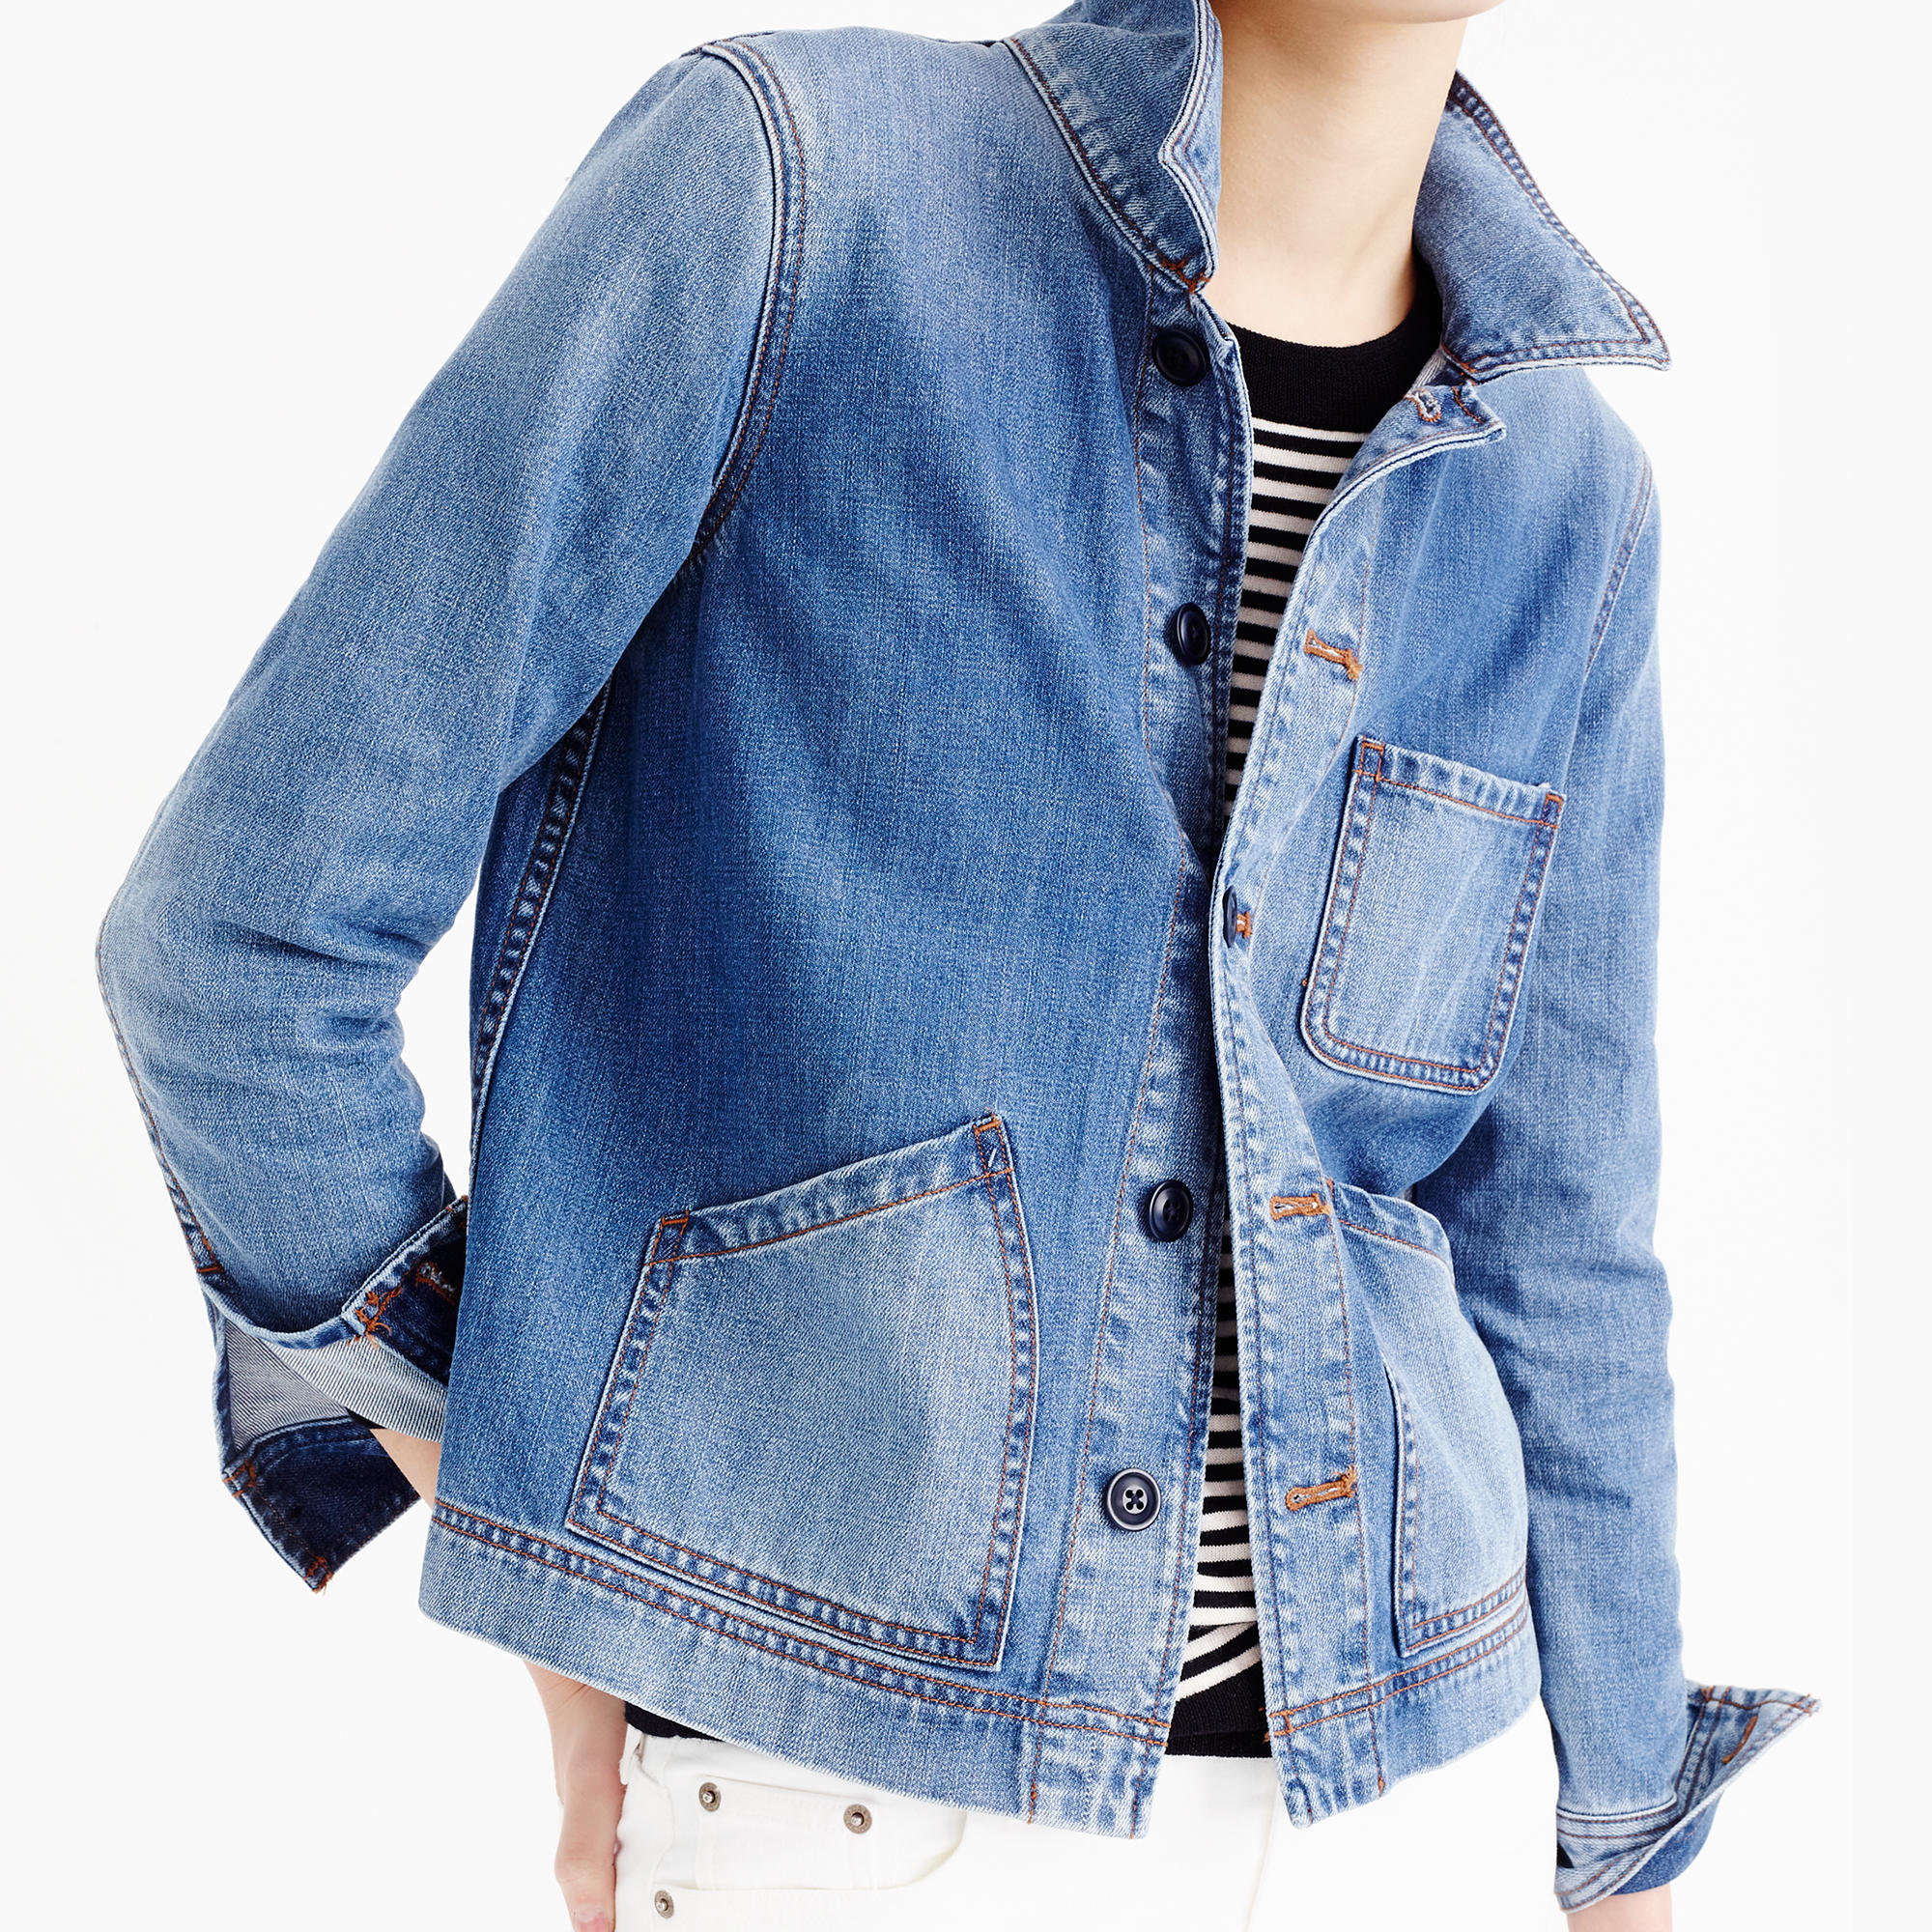 J Crew denim jacket_DM1177_d1